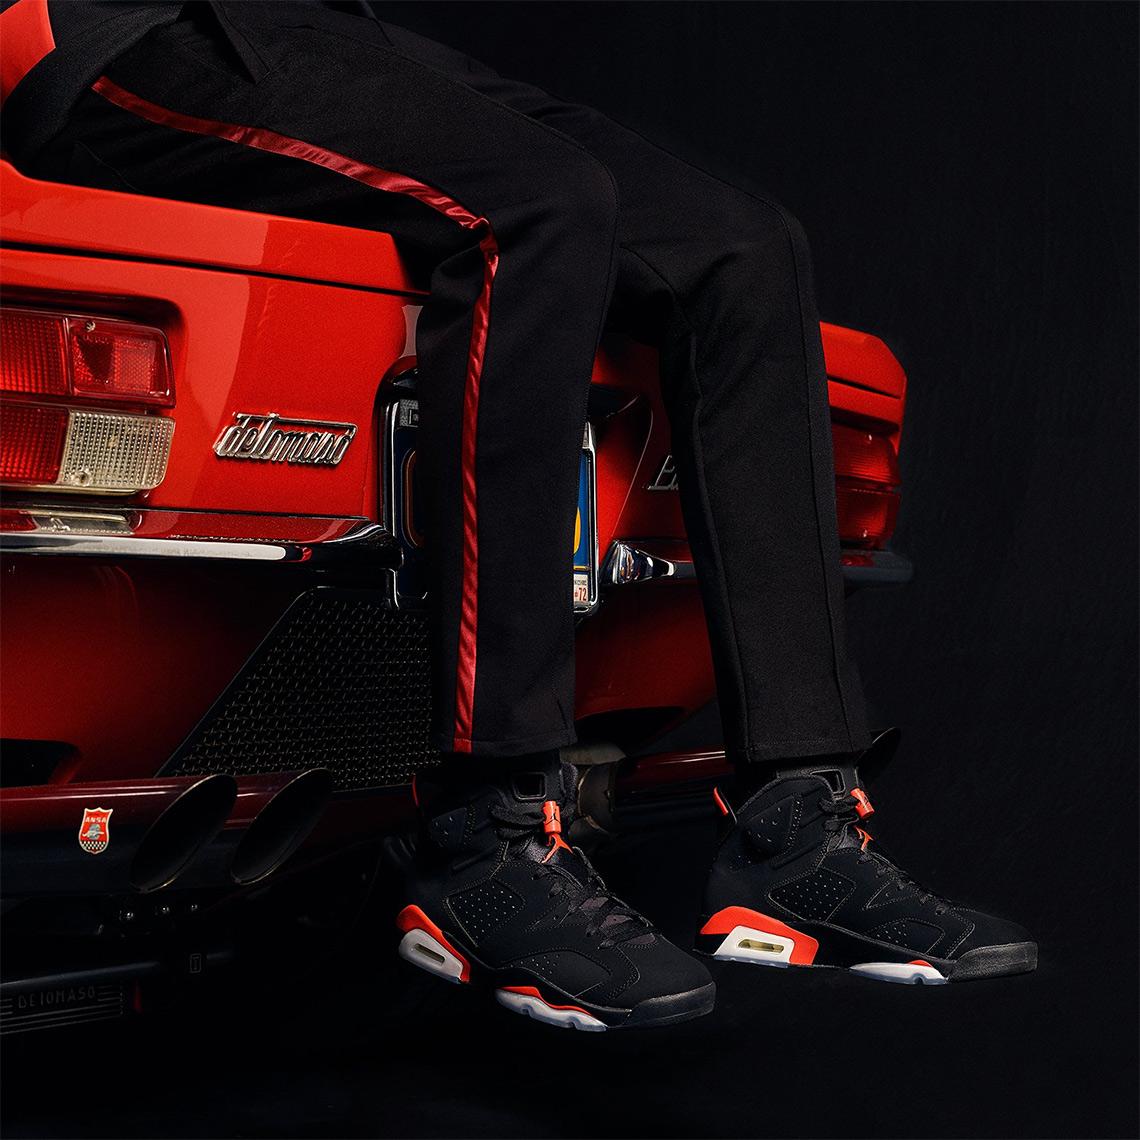 new product 6de6c efb7a Air Jordan 6 Infrared Shoes + Apparel Release Info   SneakerNews.com